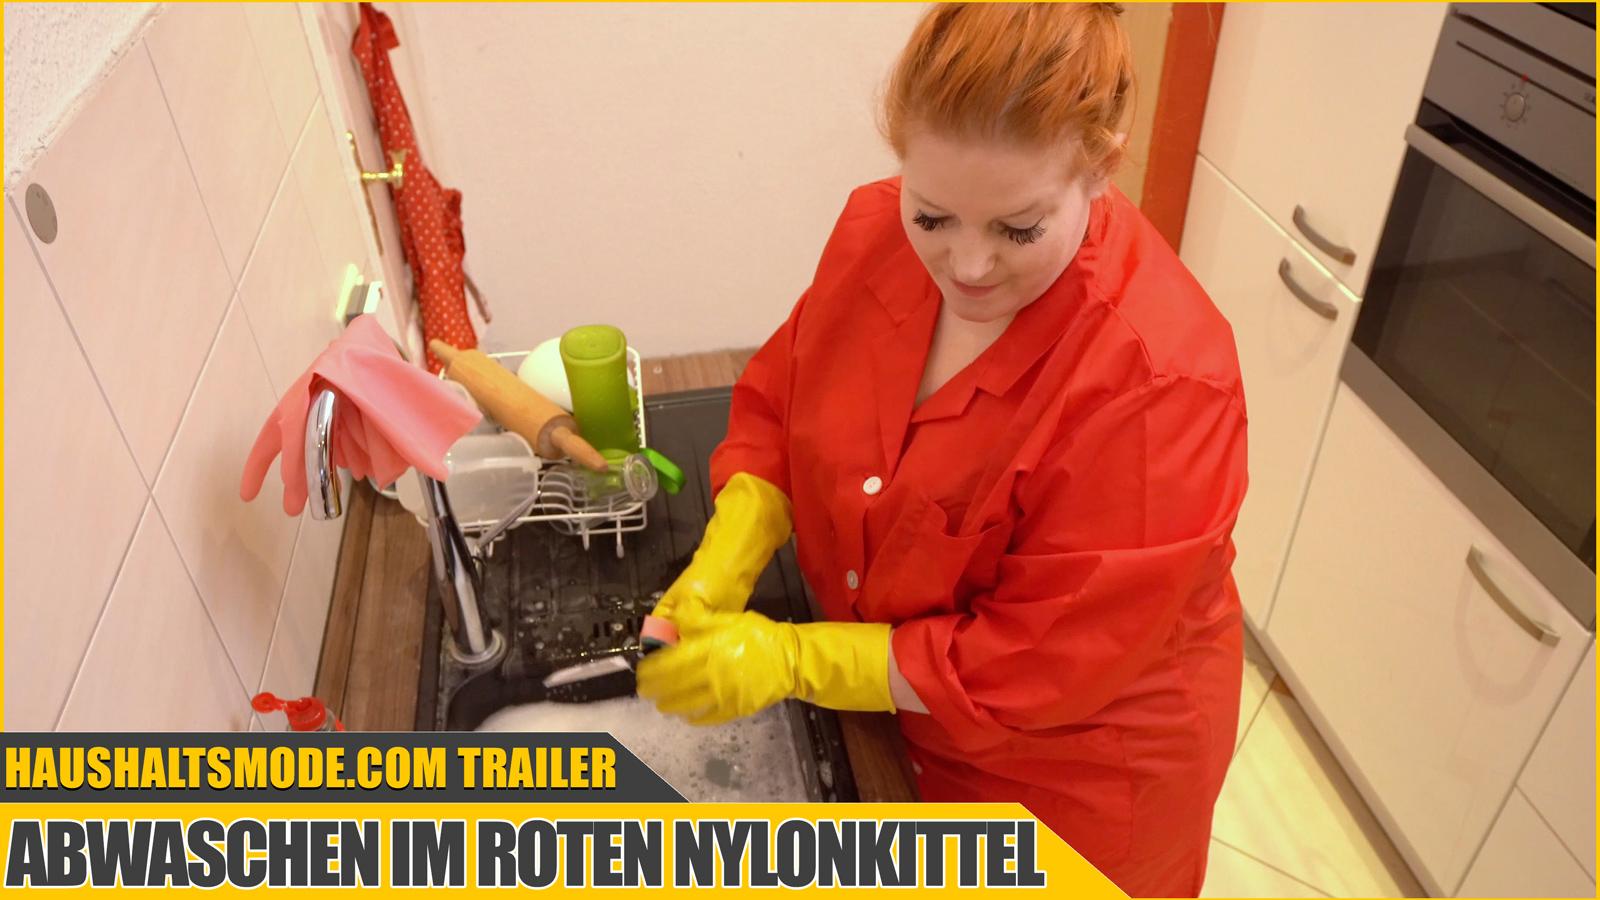 Paula Video 001: Abwaschen im roten Nylonkittel